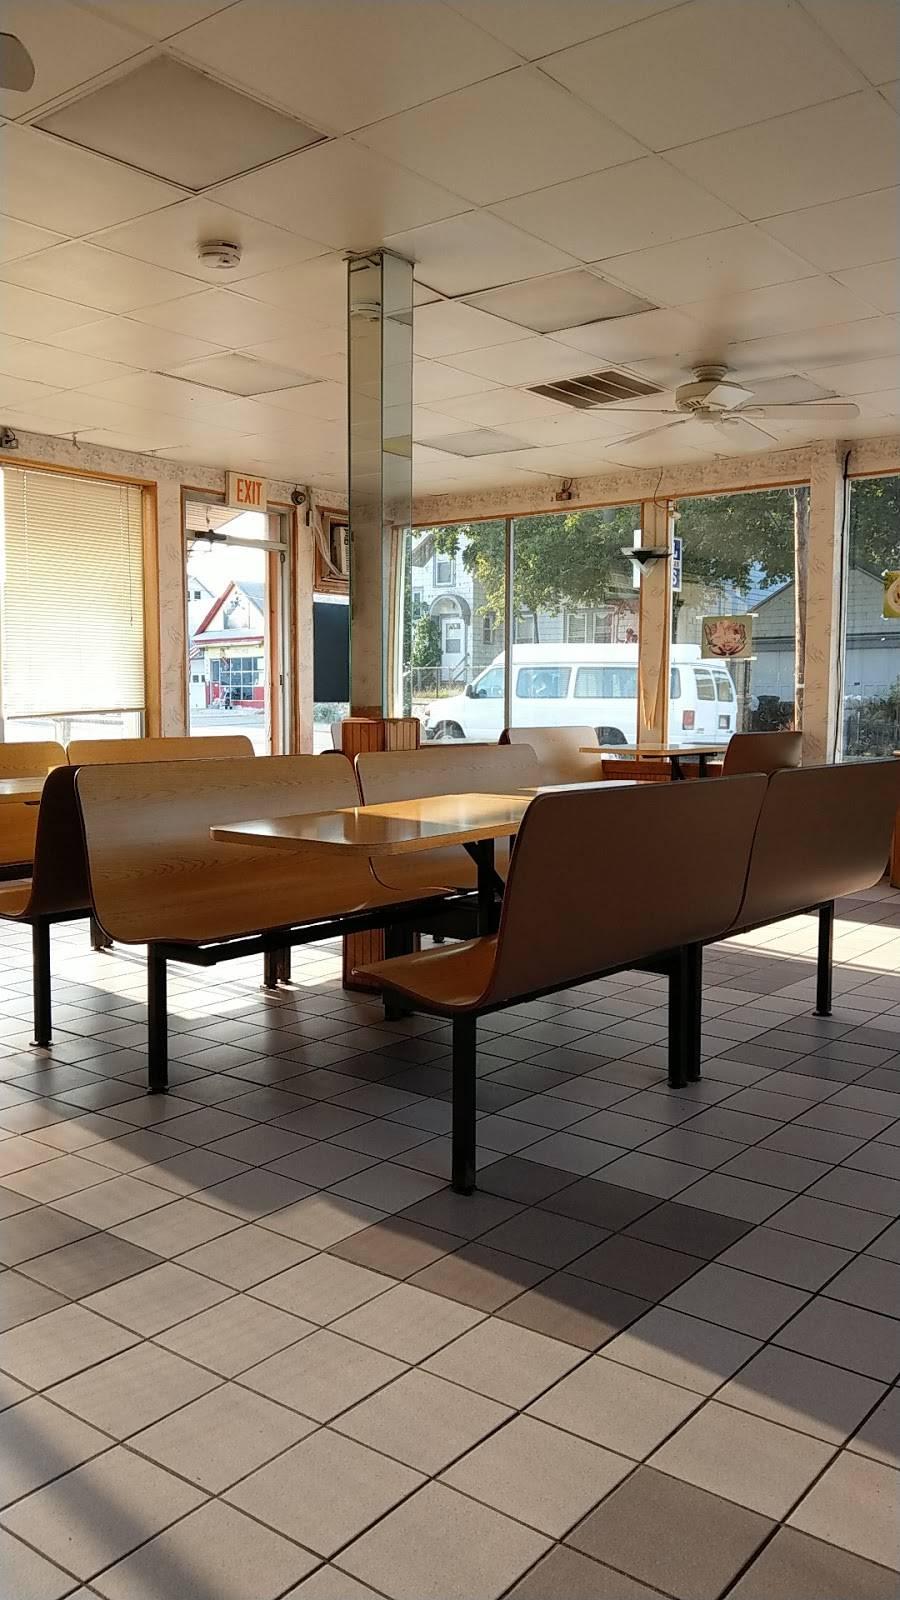 Lucky Garden | restaurant | 8 Haverhill St, Lawrence, MA 01841, USA | 9786819312 OR +1 978-681-9312